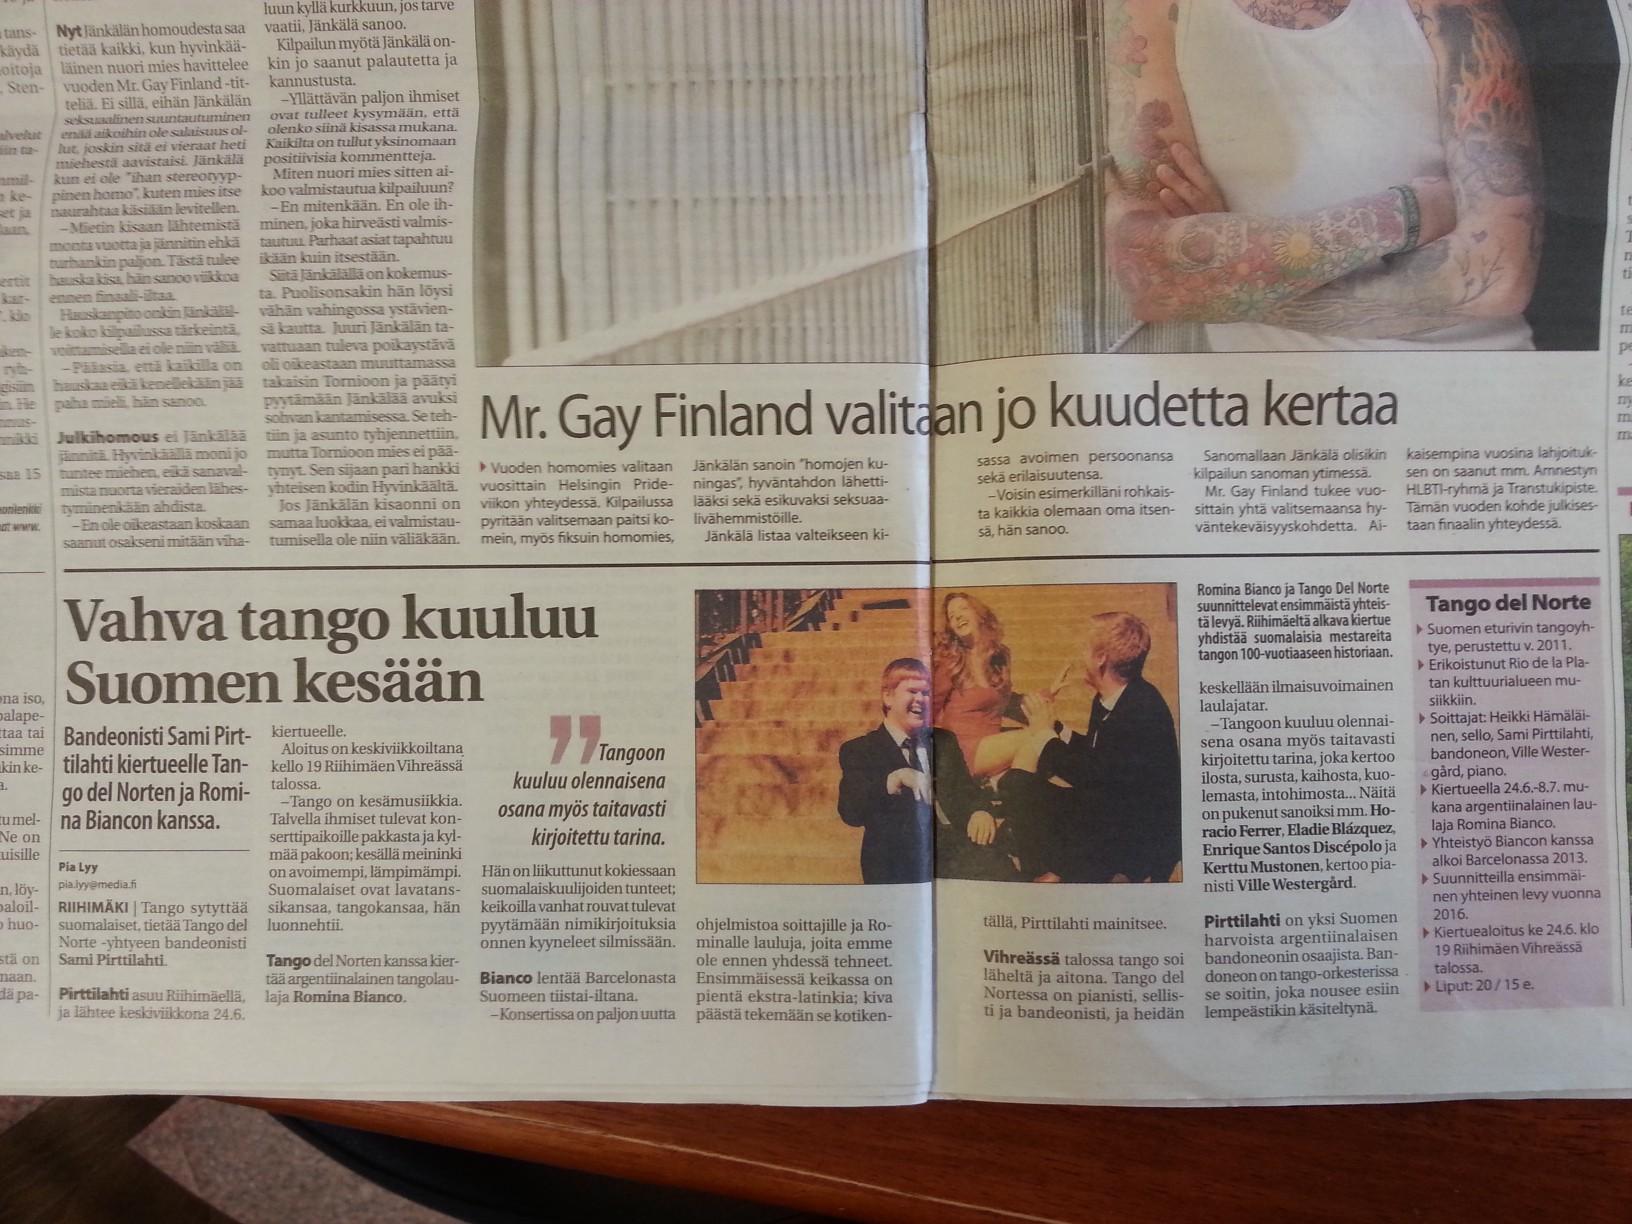 Finland summer tour 2015